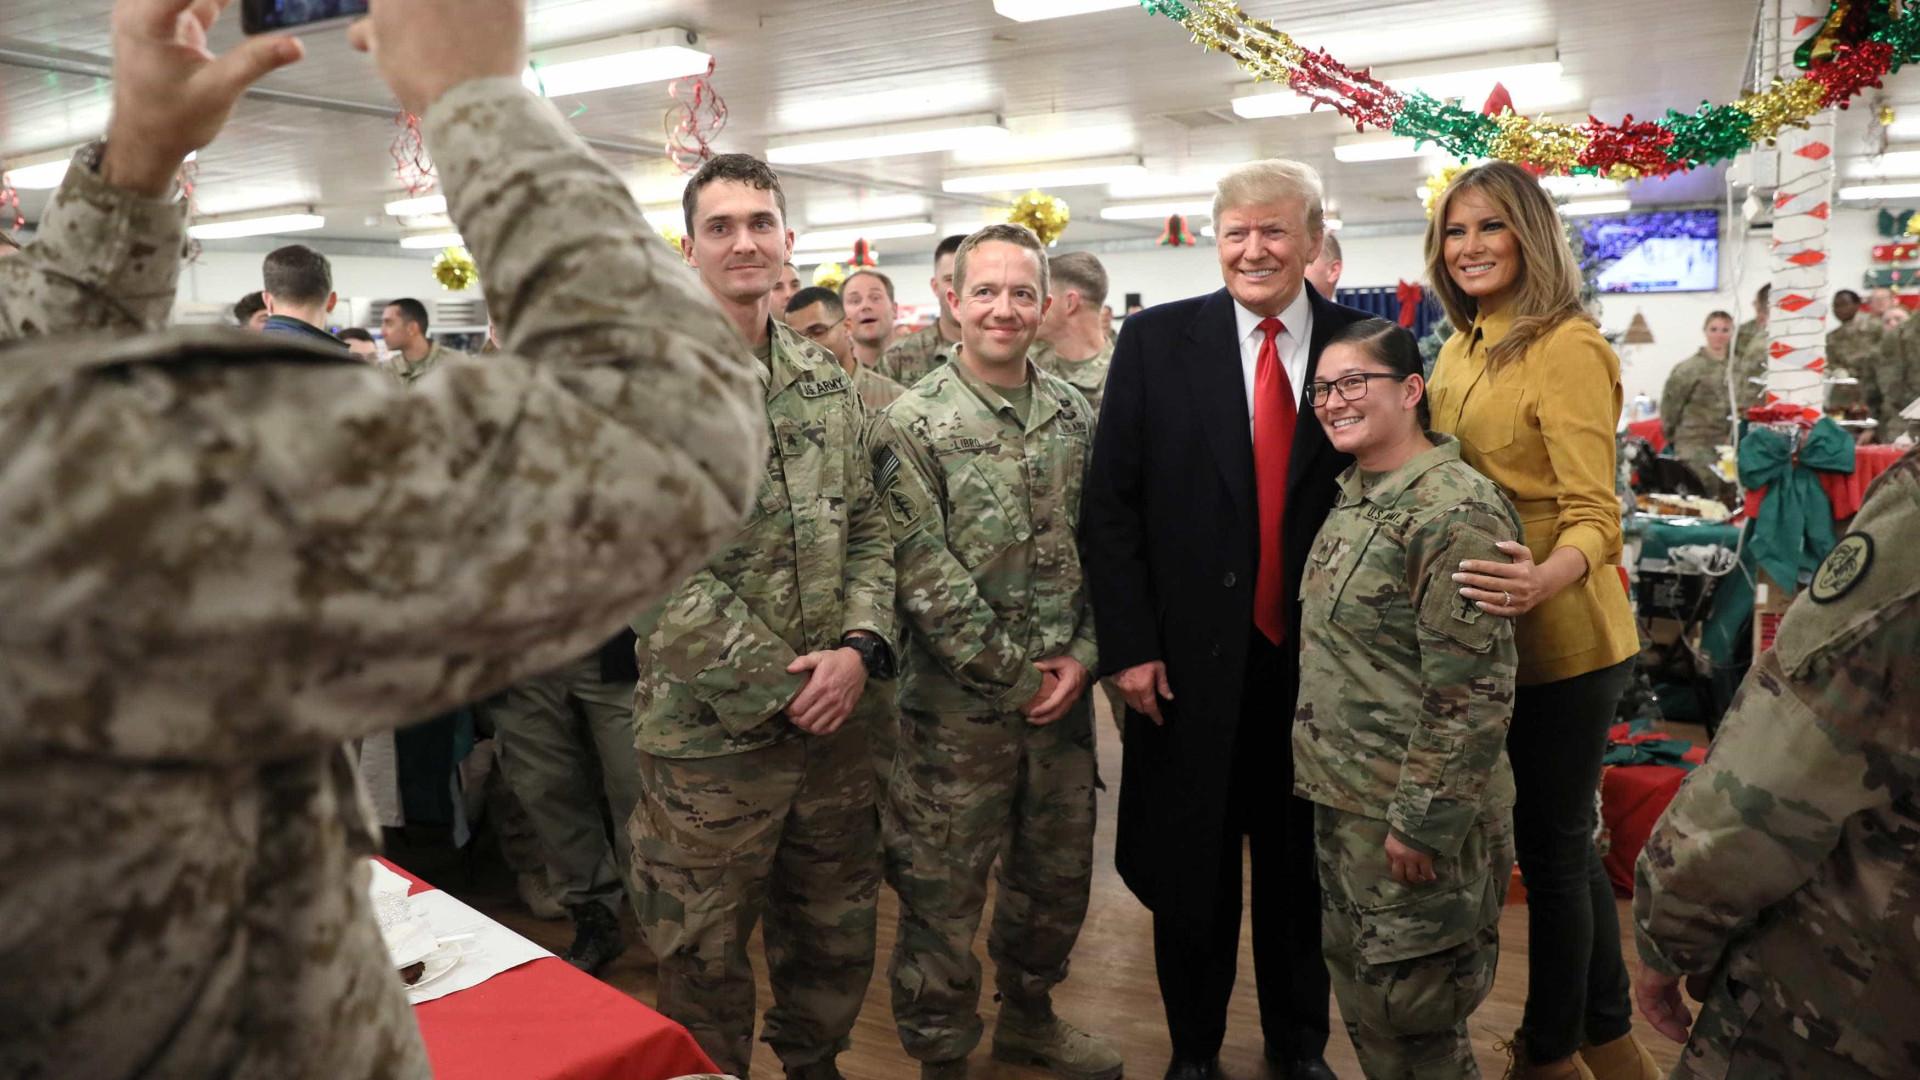 No Natal, Trump faz visita surpresa a militares no Iraque